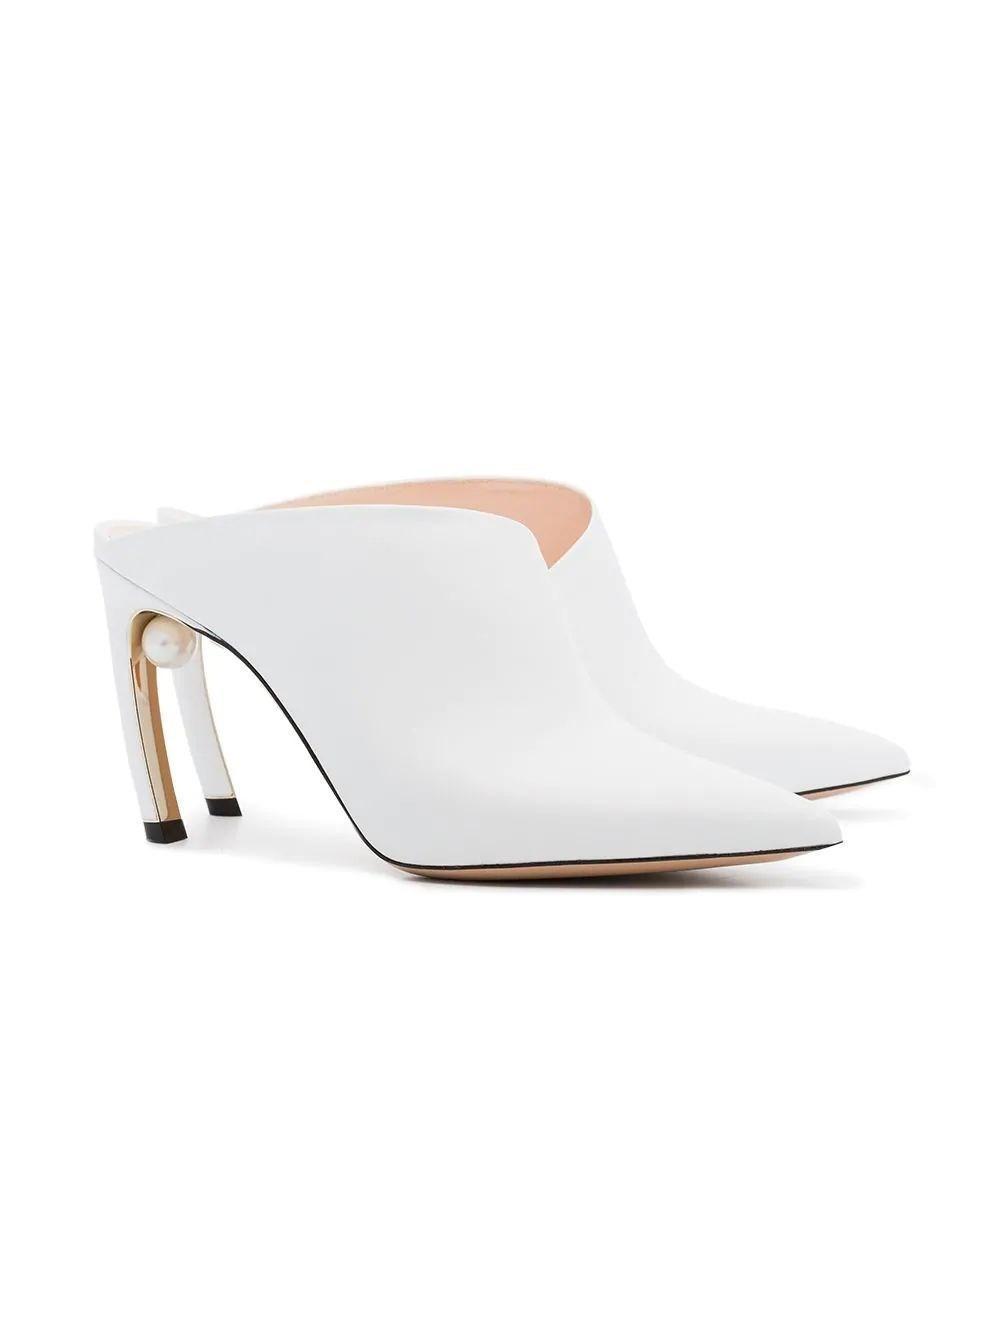 13261c7b2c5 Lyst - Nicholas Kirkwood Women s 909a51vls4w01 White Leather Heels in White